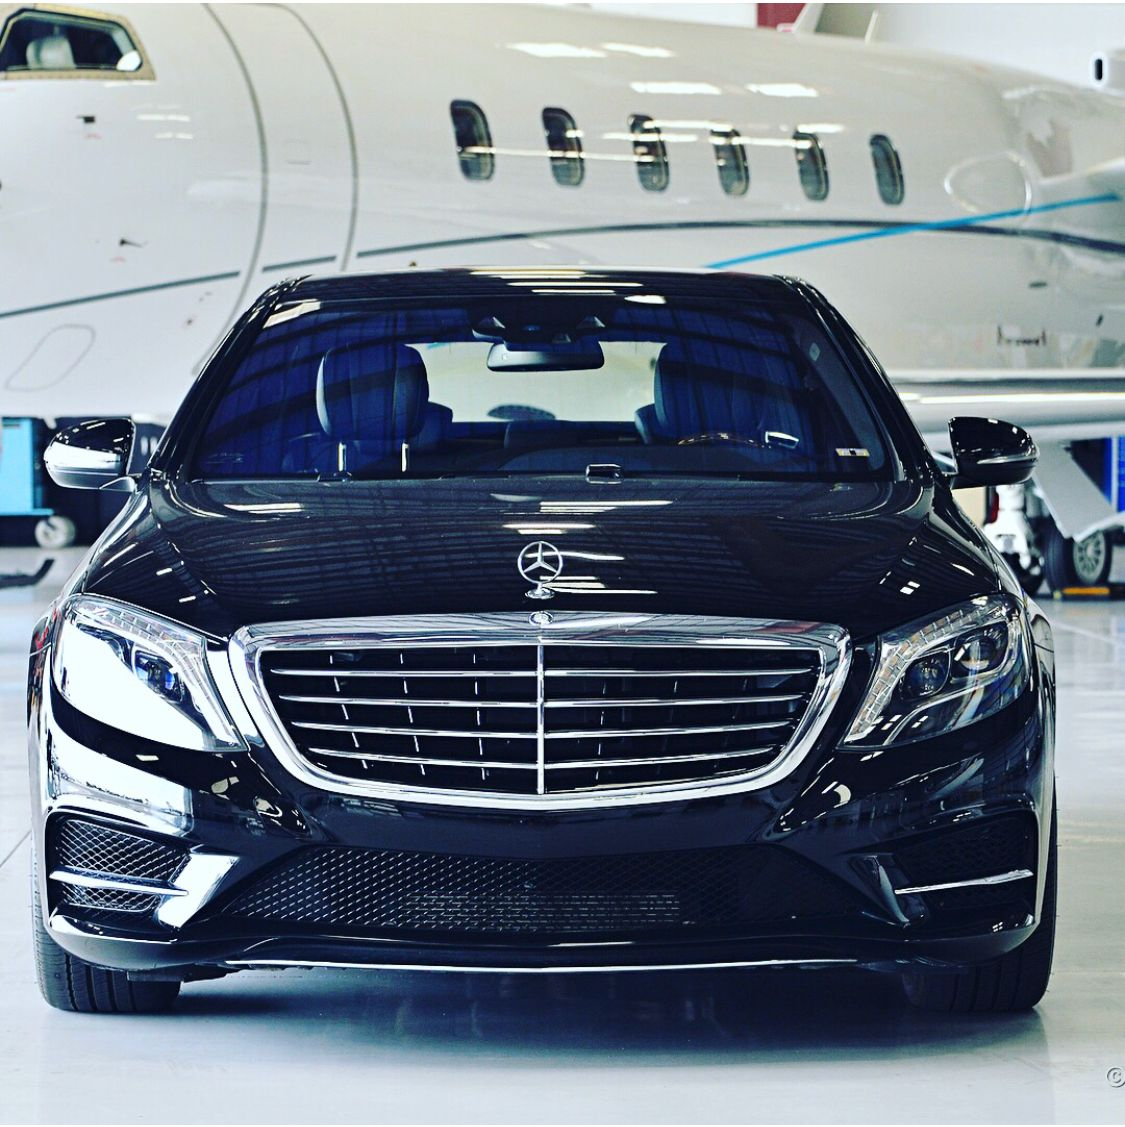 First class sedan luxury cars fleet sedan